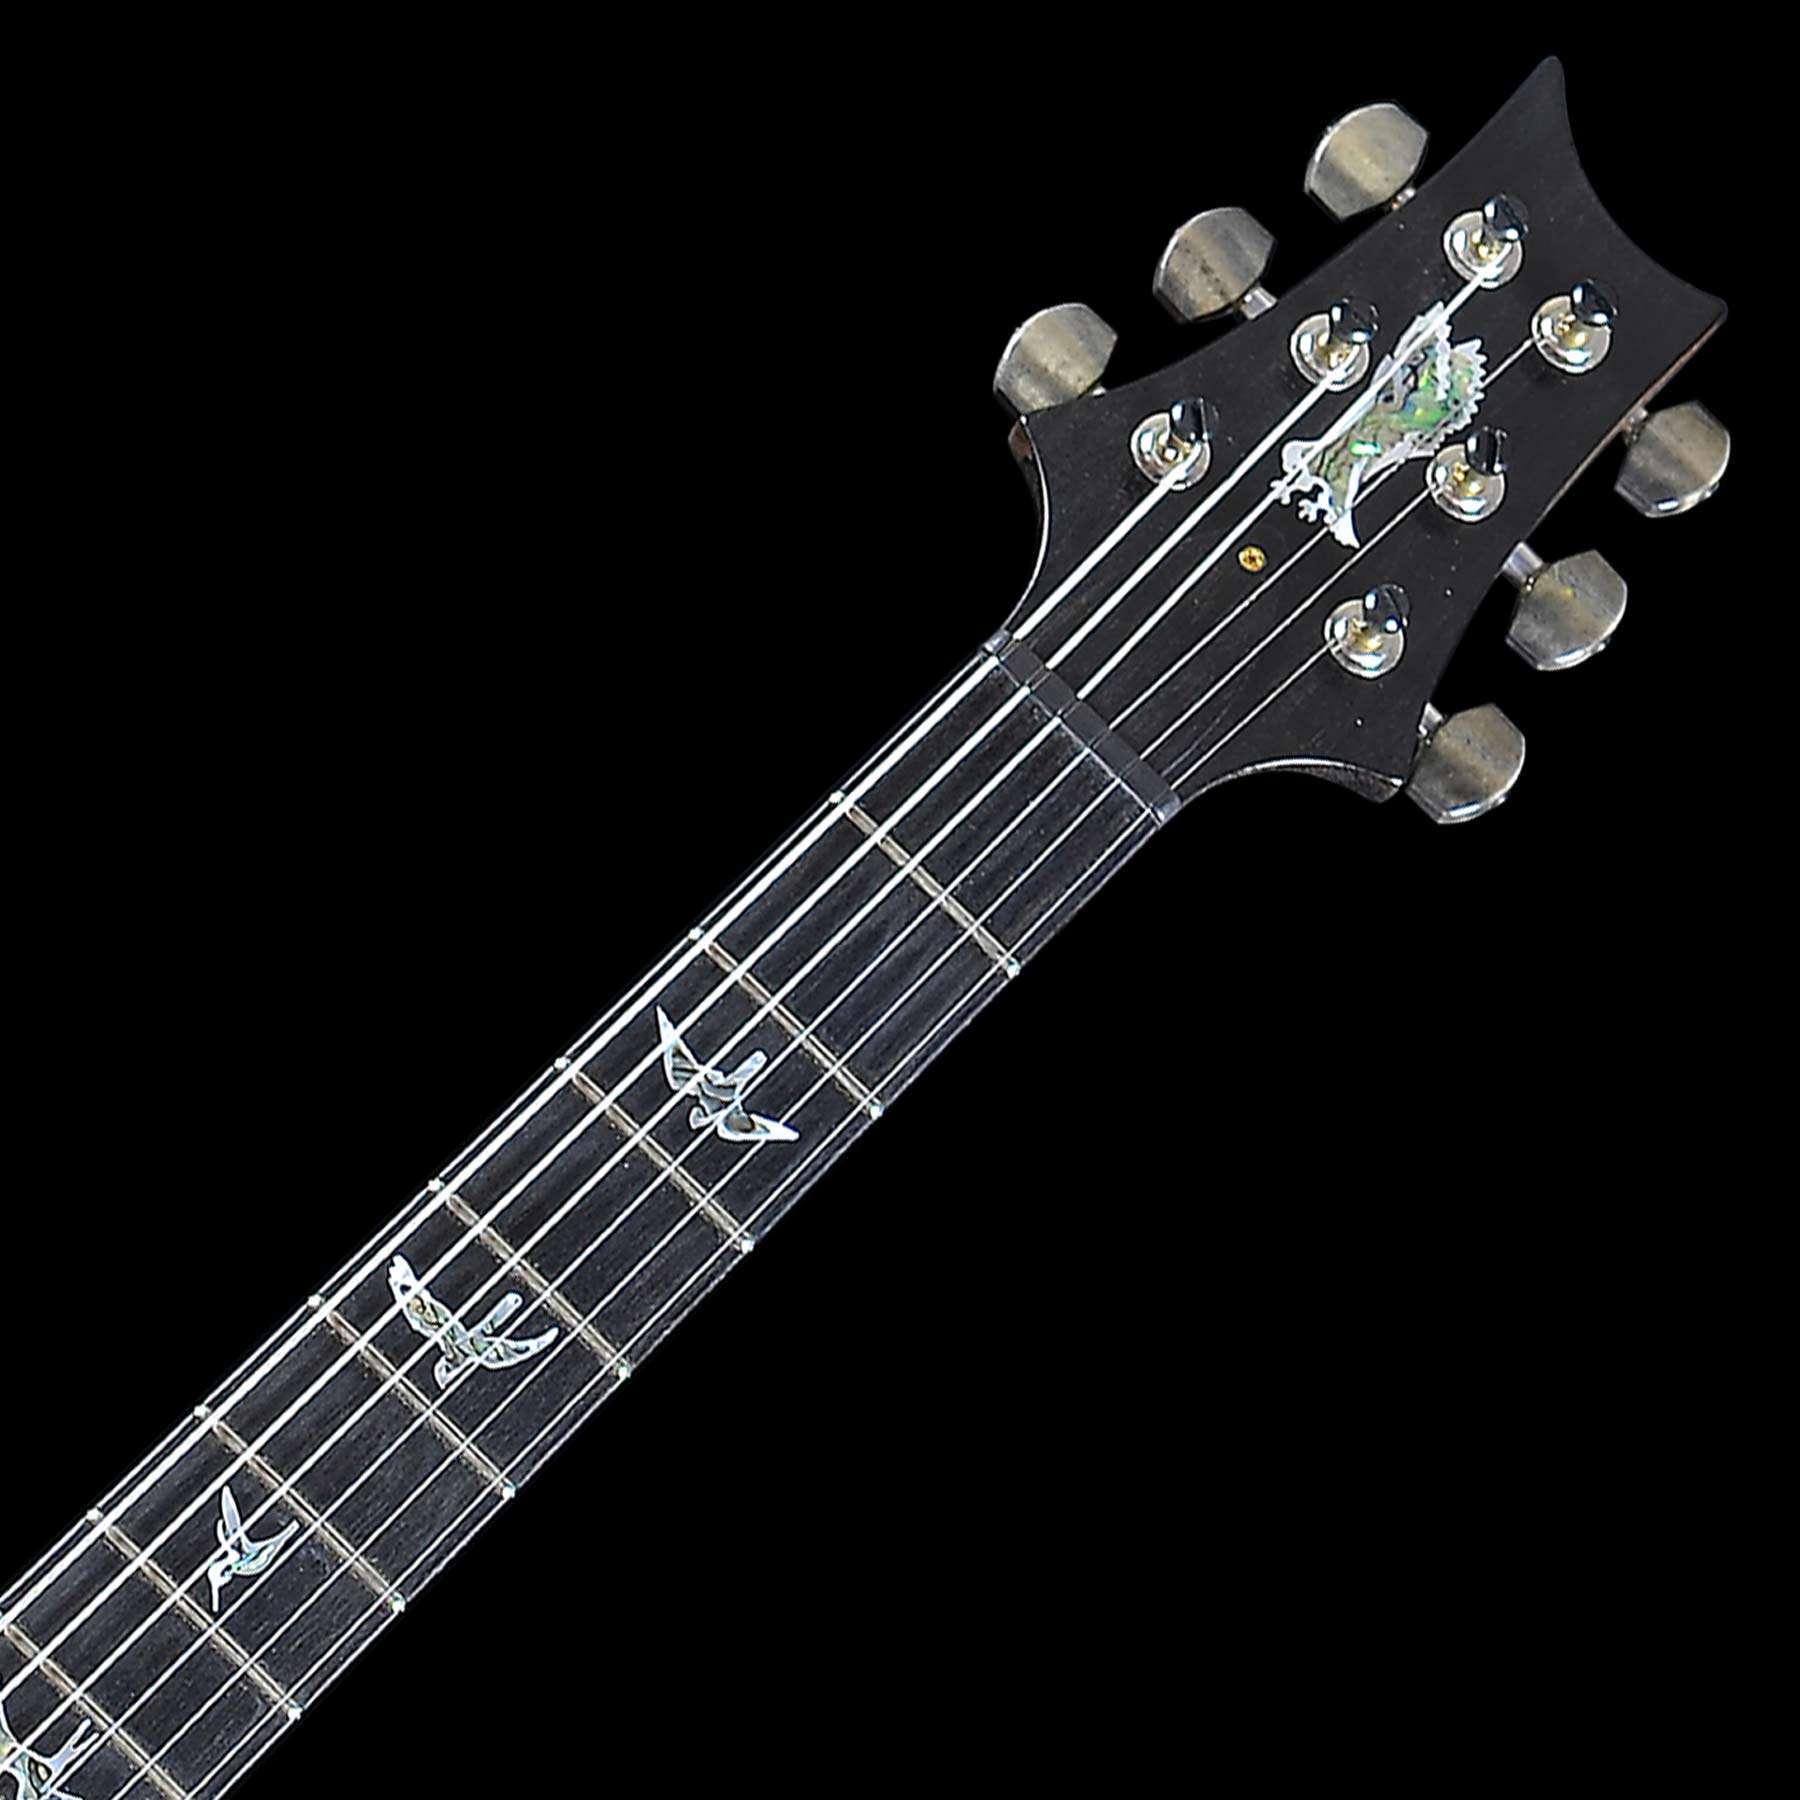 Samick Electric Guitar Wiring Diagram : Samick guitar wiring diagram caterpillar c ecm